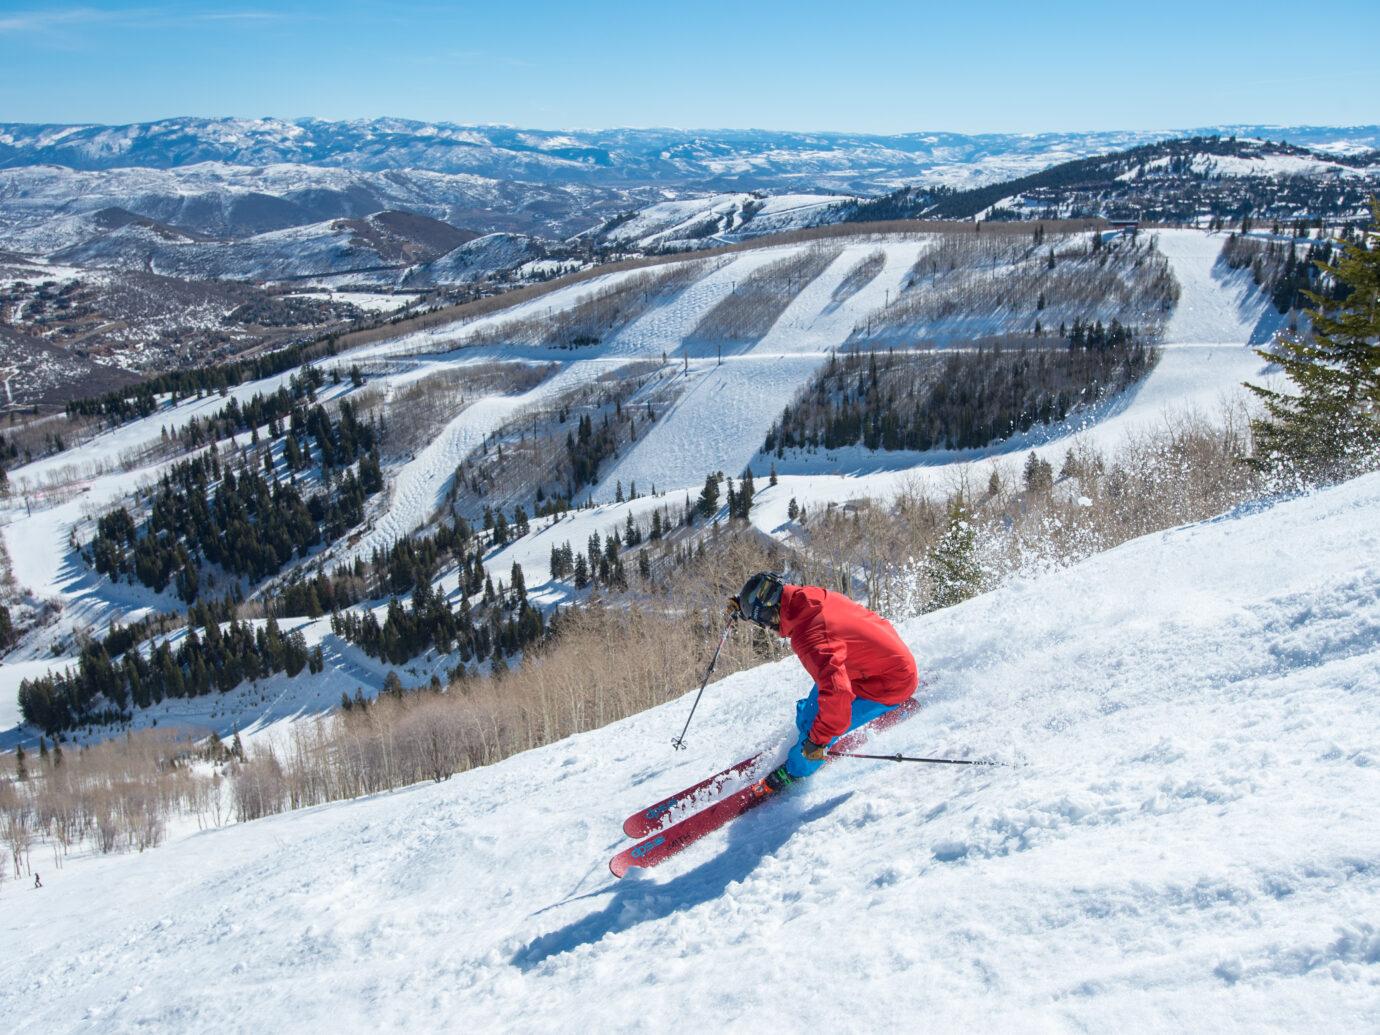 Skiing outside of Lodge at Blue Sky, Utah